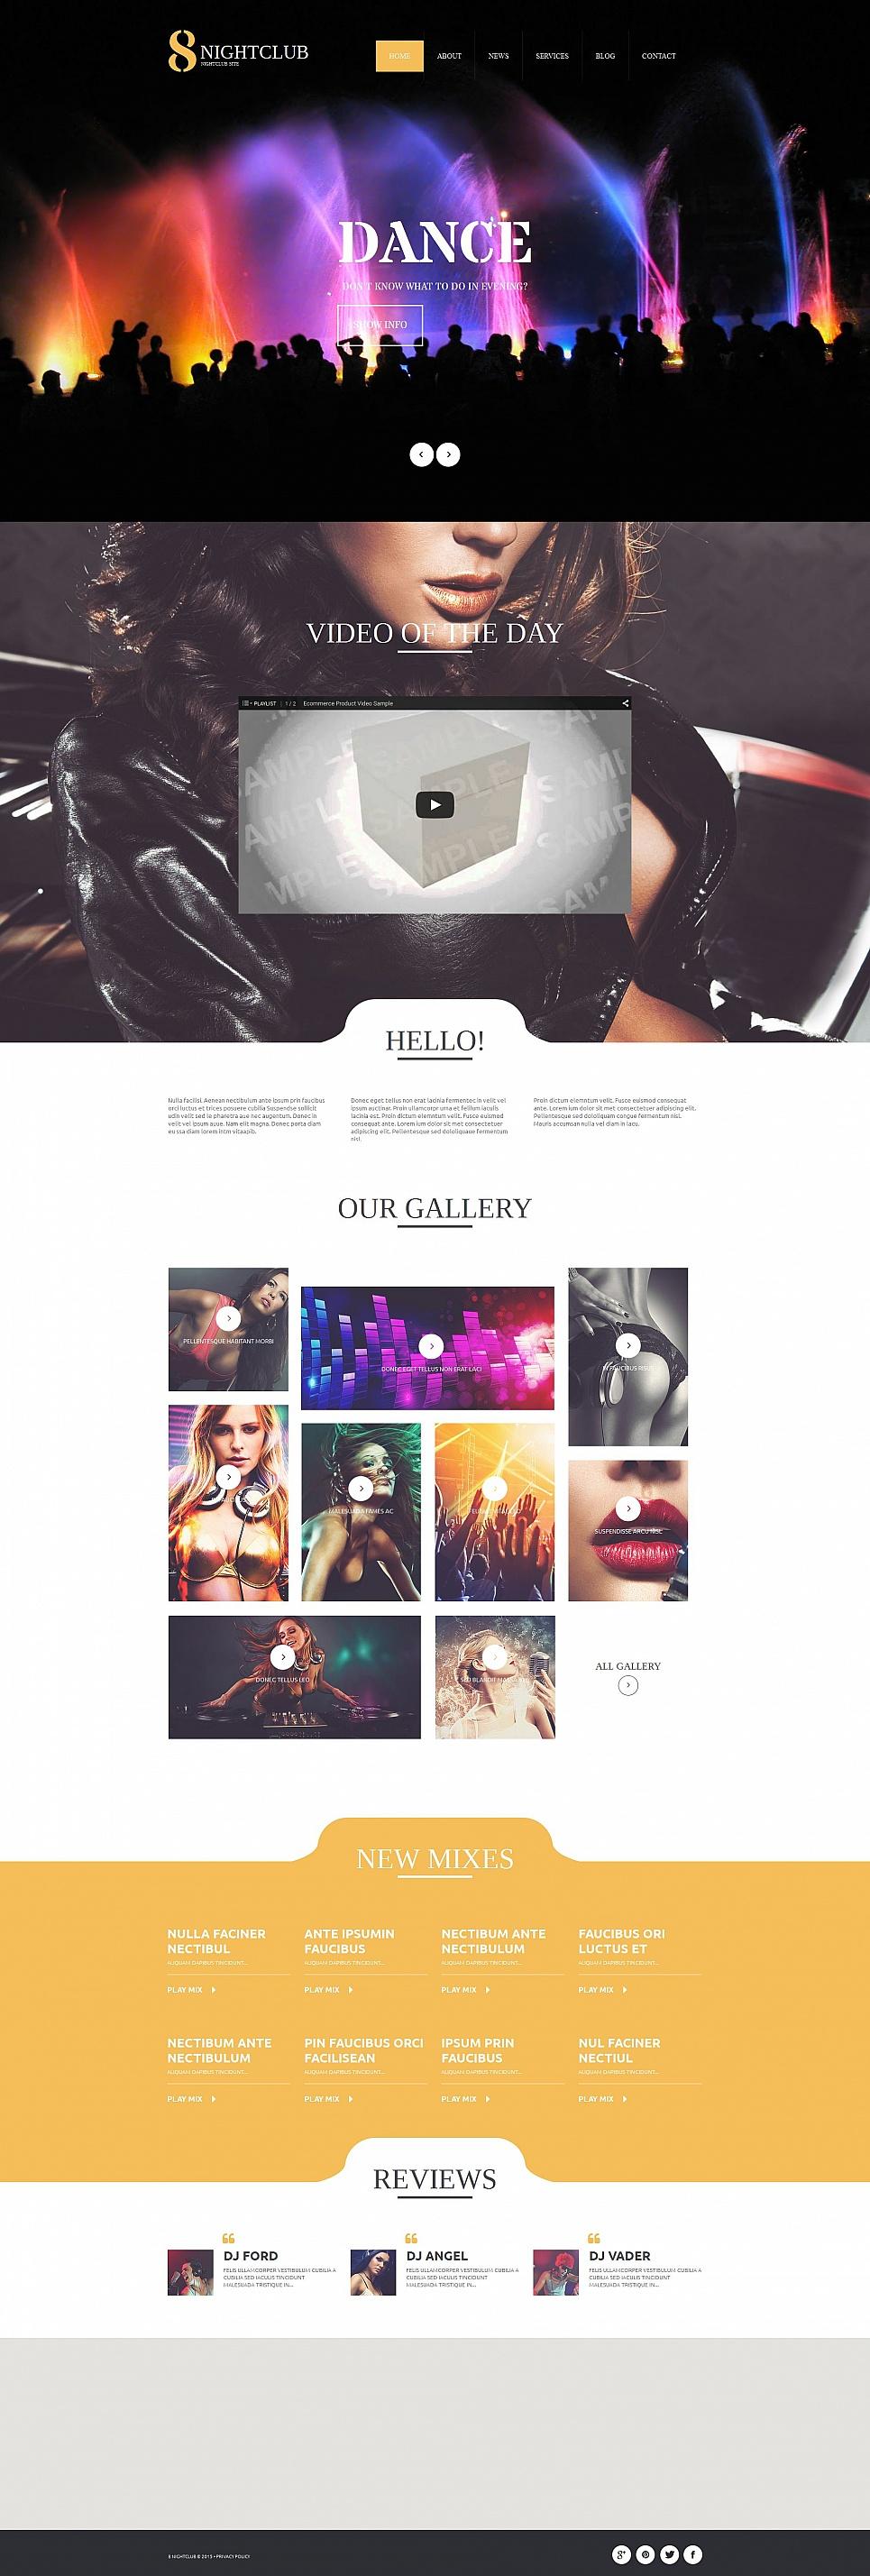 Dark nightclubbing website template